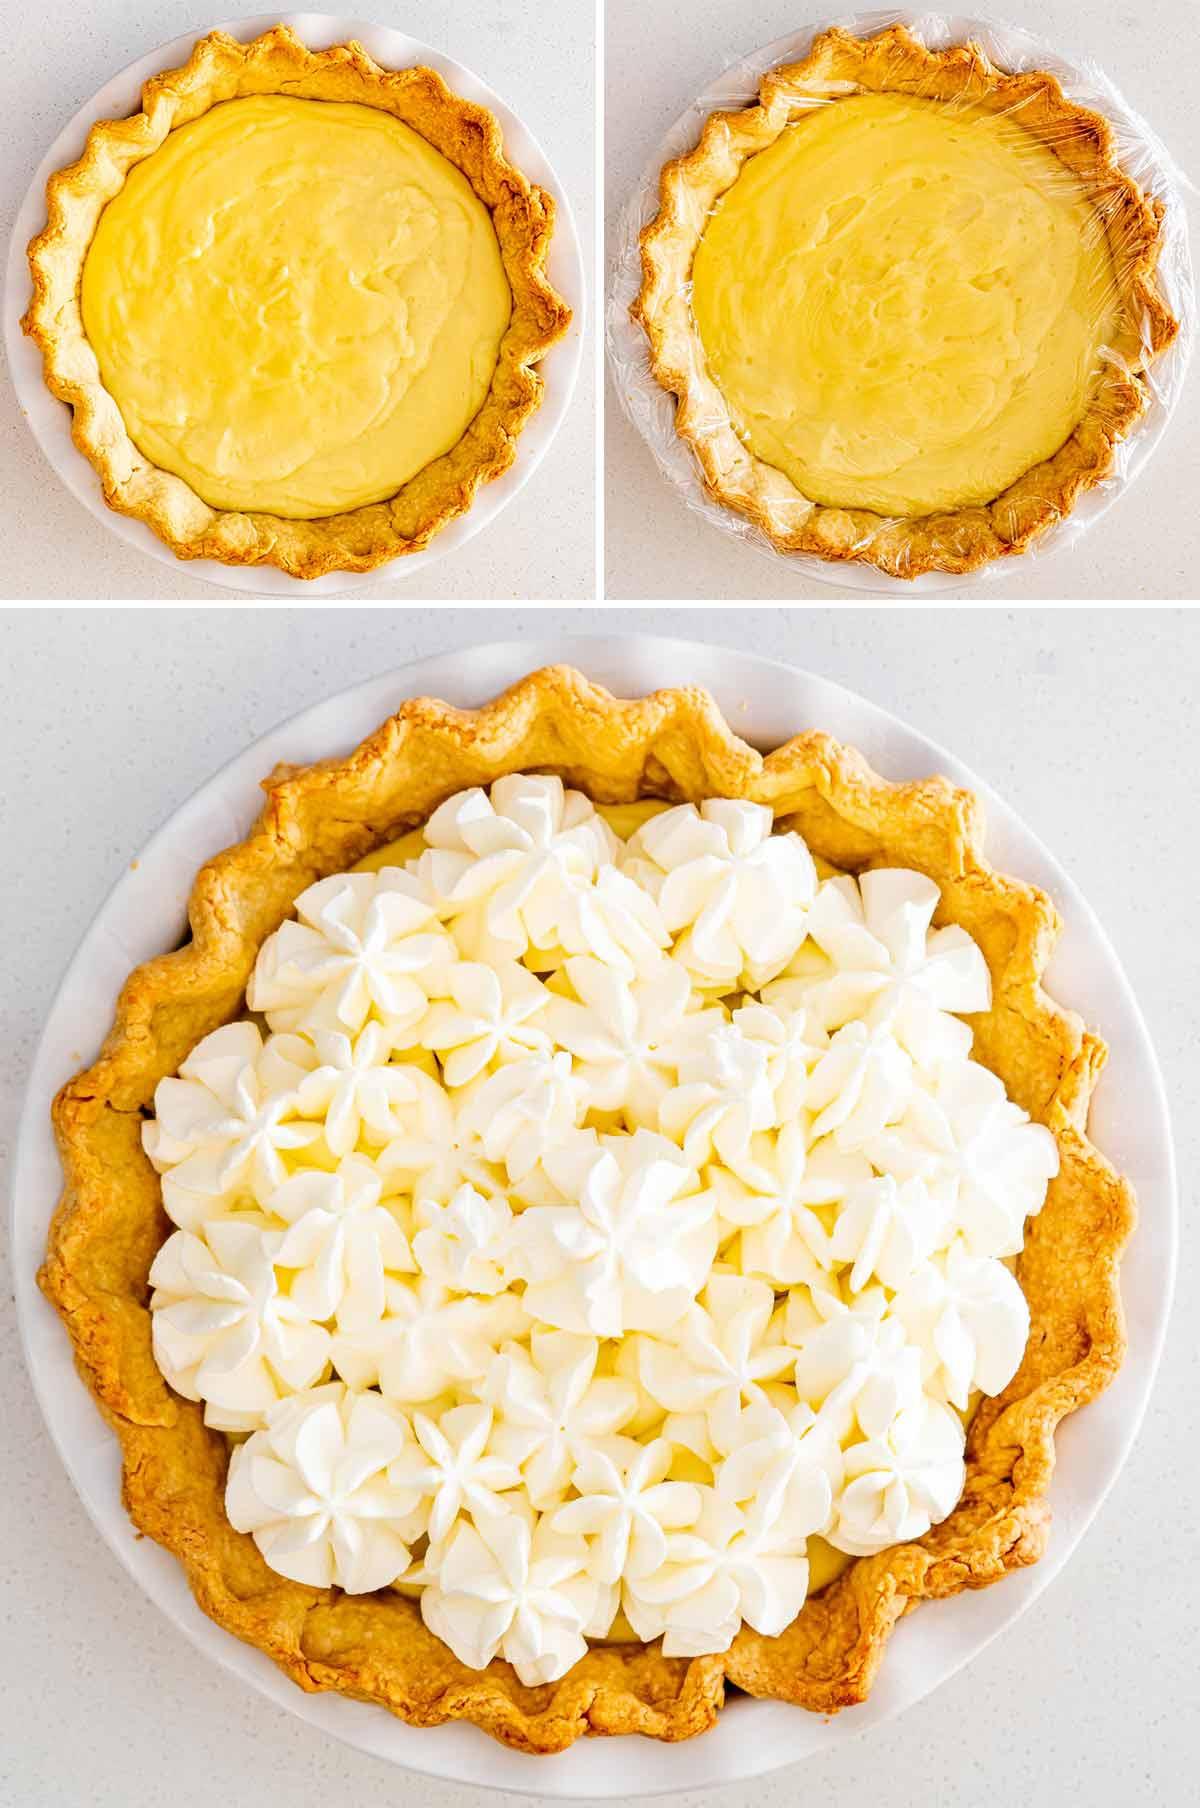 process shots showing how to assemble coconut cream pie.